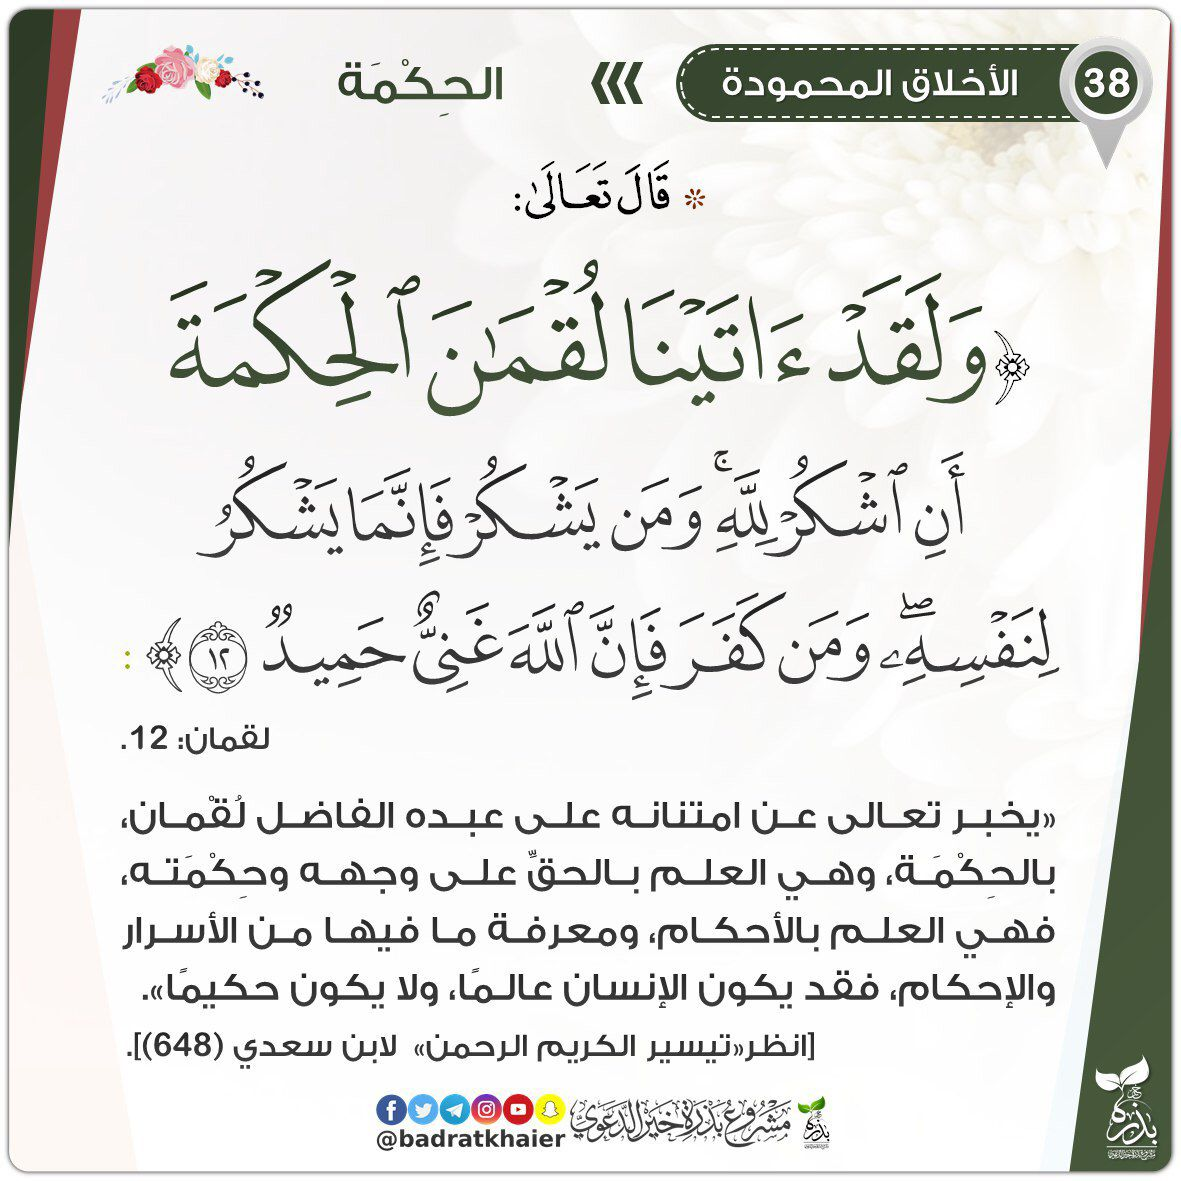 الحكمة Noble Quran Word Search Puzzle Words